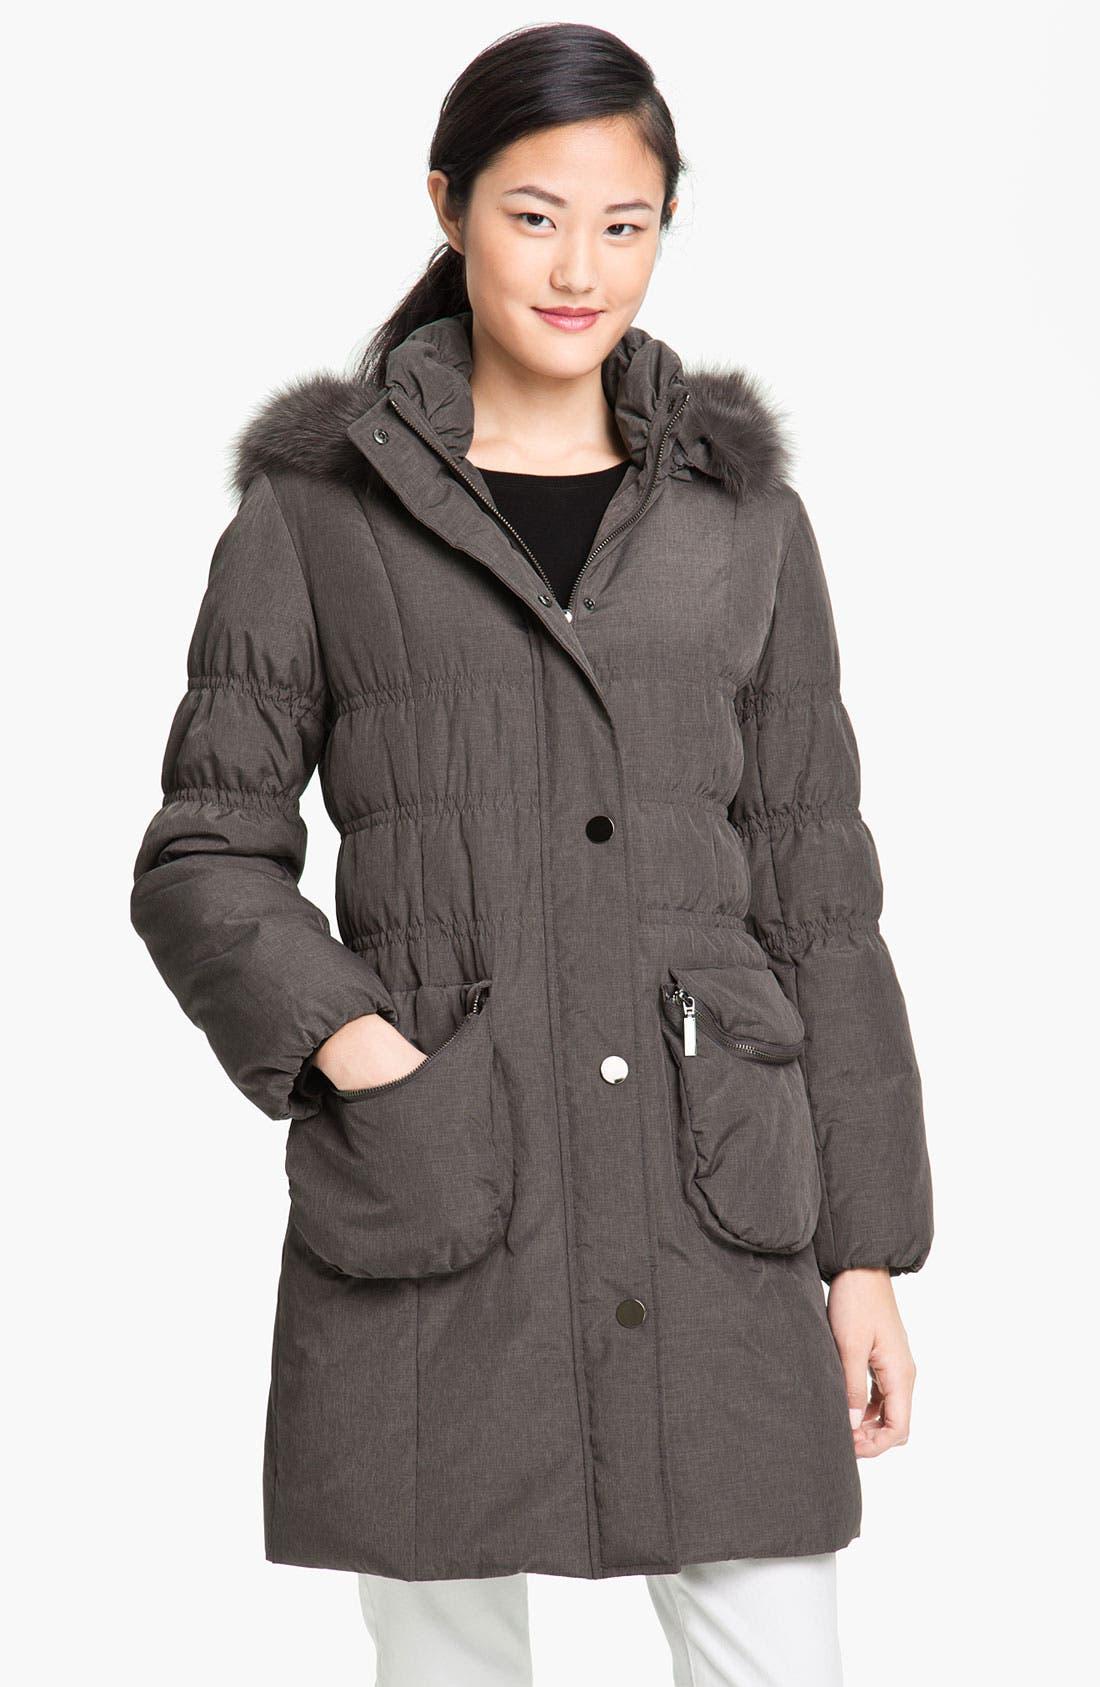 Main Image - Jessica Wilde Down Coat with Genuine Fox Fur